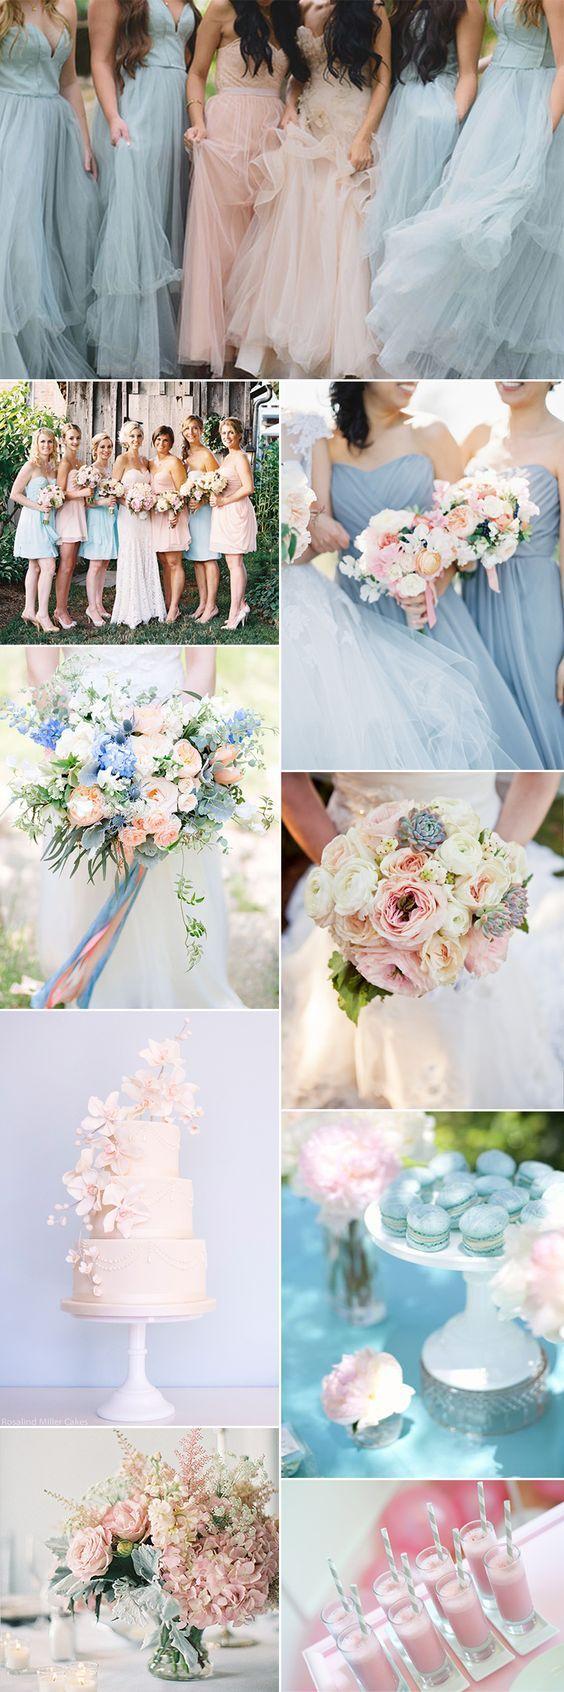 Pink u blue wedding ideas inspired by pantone rose quartz pantone